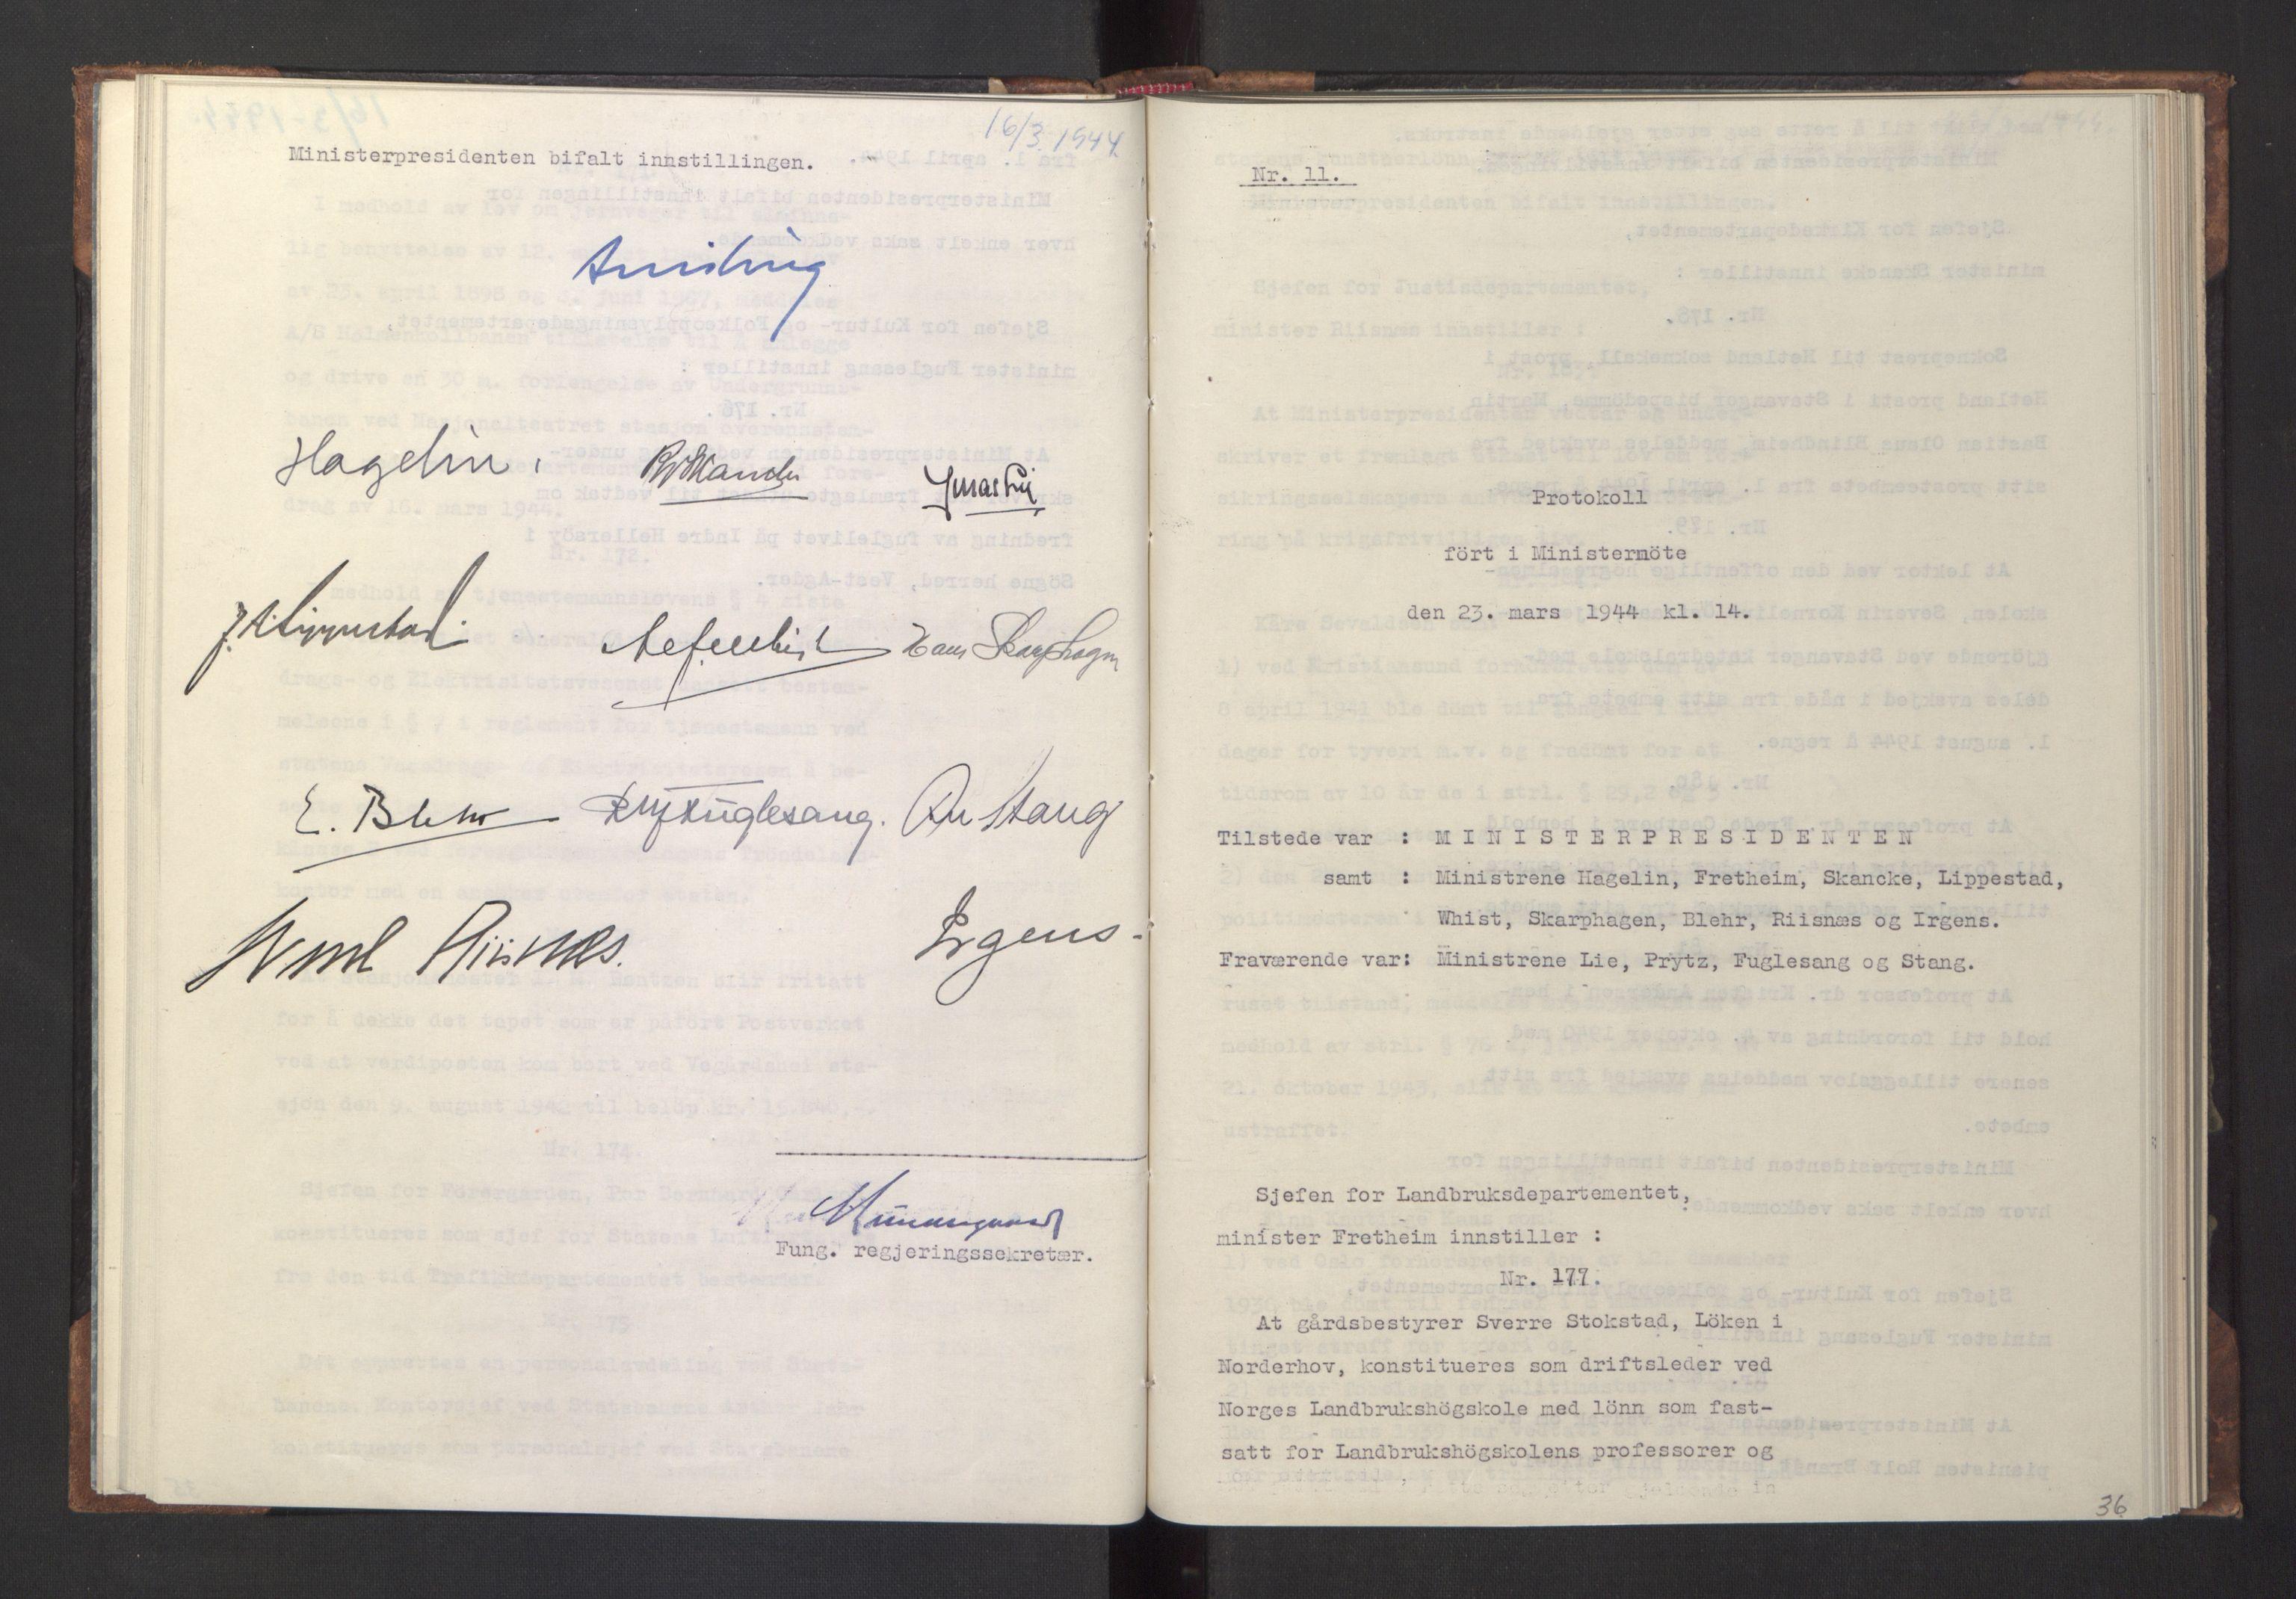 RA, NS-administrasjonen 1940-1945 (Statsrådsekretariatet, de kommisariske statsråder mm), D/Da/L0005: Protokoll fra ministermøter, 1944, s. 35b-36a